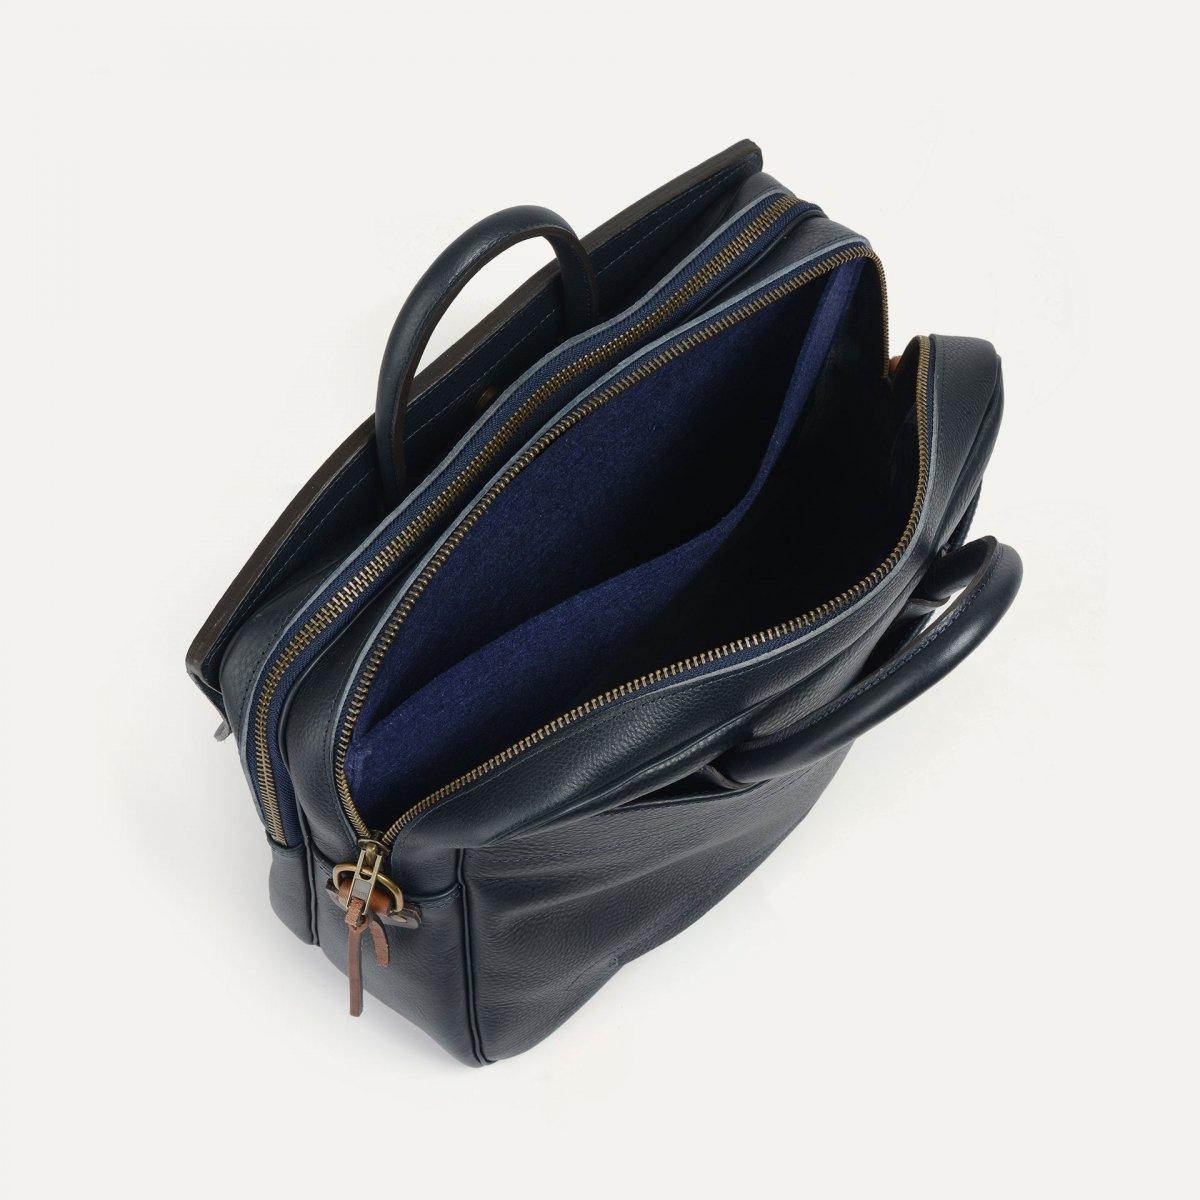 Zeppo Business bag - Navy Blue / E Pure (image n°4)